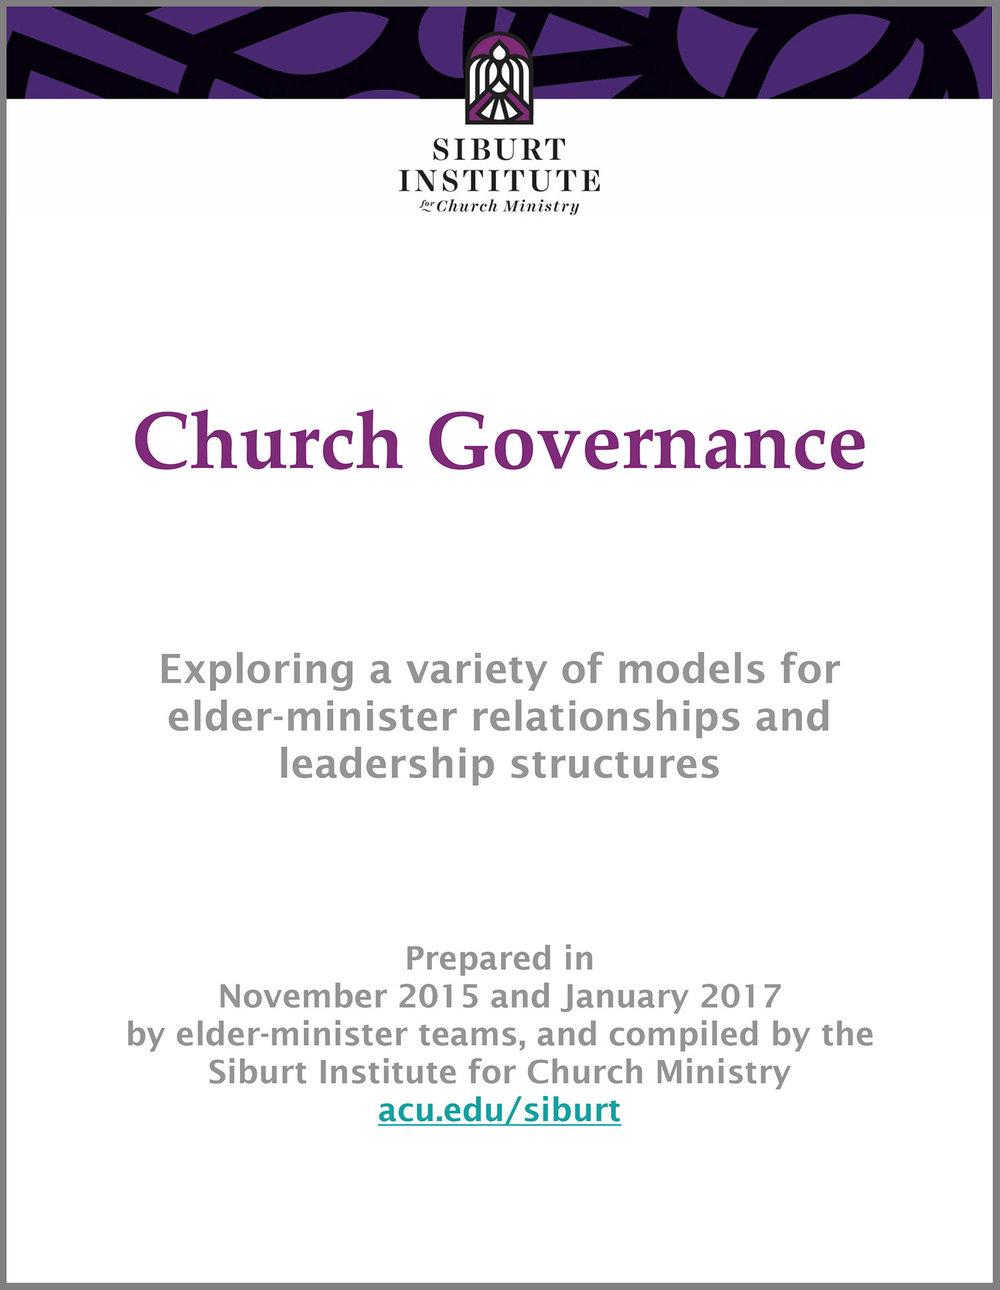 Church Governance document